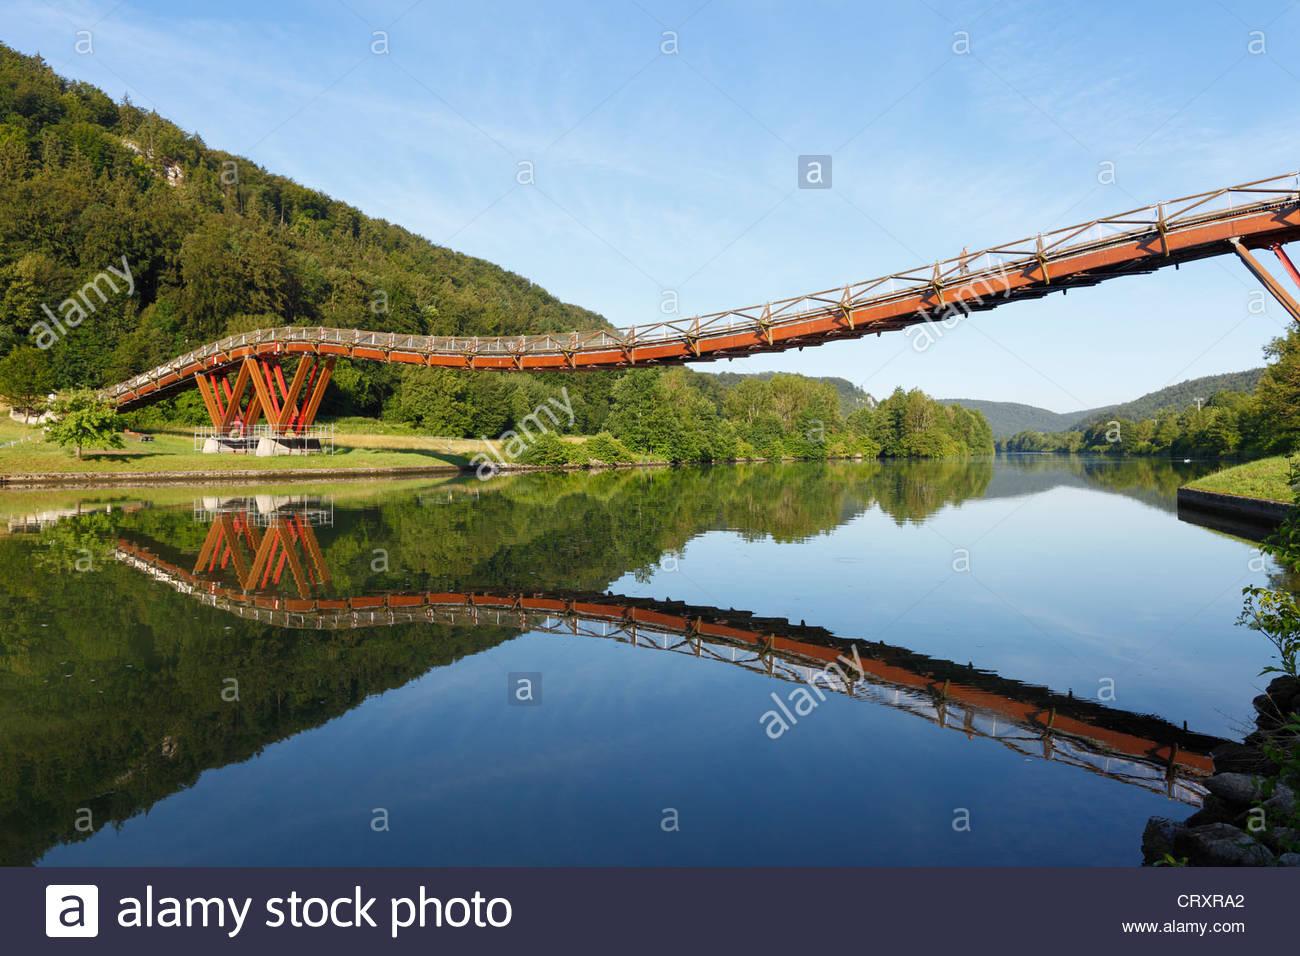 Germany, Bavaria, Lower Bavaria, View of wooden Tatzelwurm Bridge - Stock Image